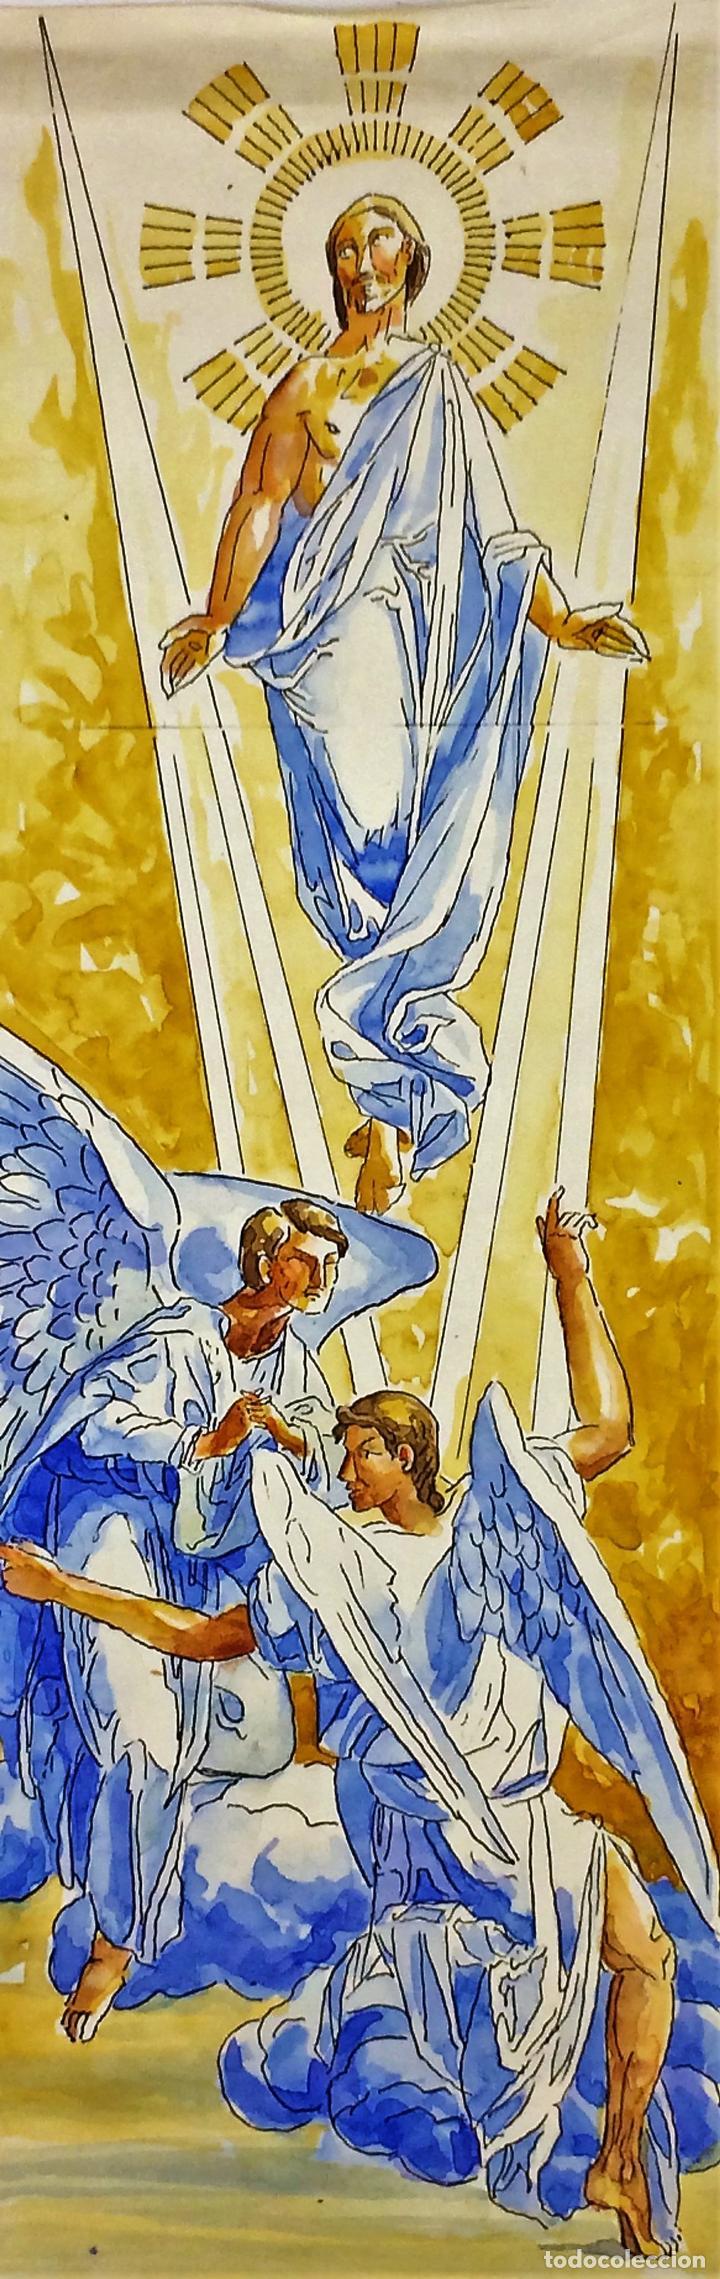 LA RESURRECCIÓN DE CRISTO. ACUARELA SOBRE PAPEL. ATRIB. GORGUES. ESPAÑA. CIRCA 1950 (Arte - Arte Religioso - Pintura Religiosa - Acuarela)